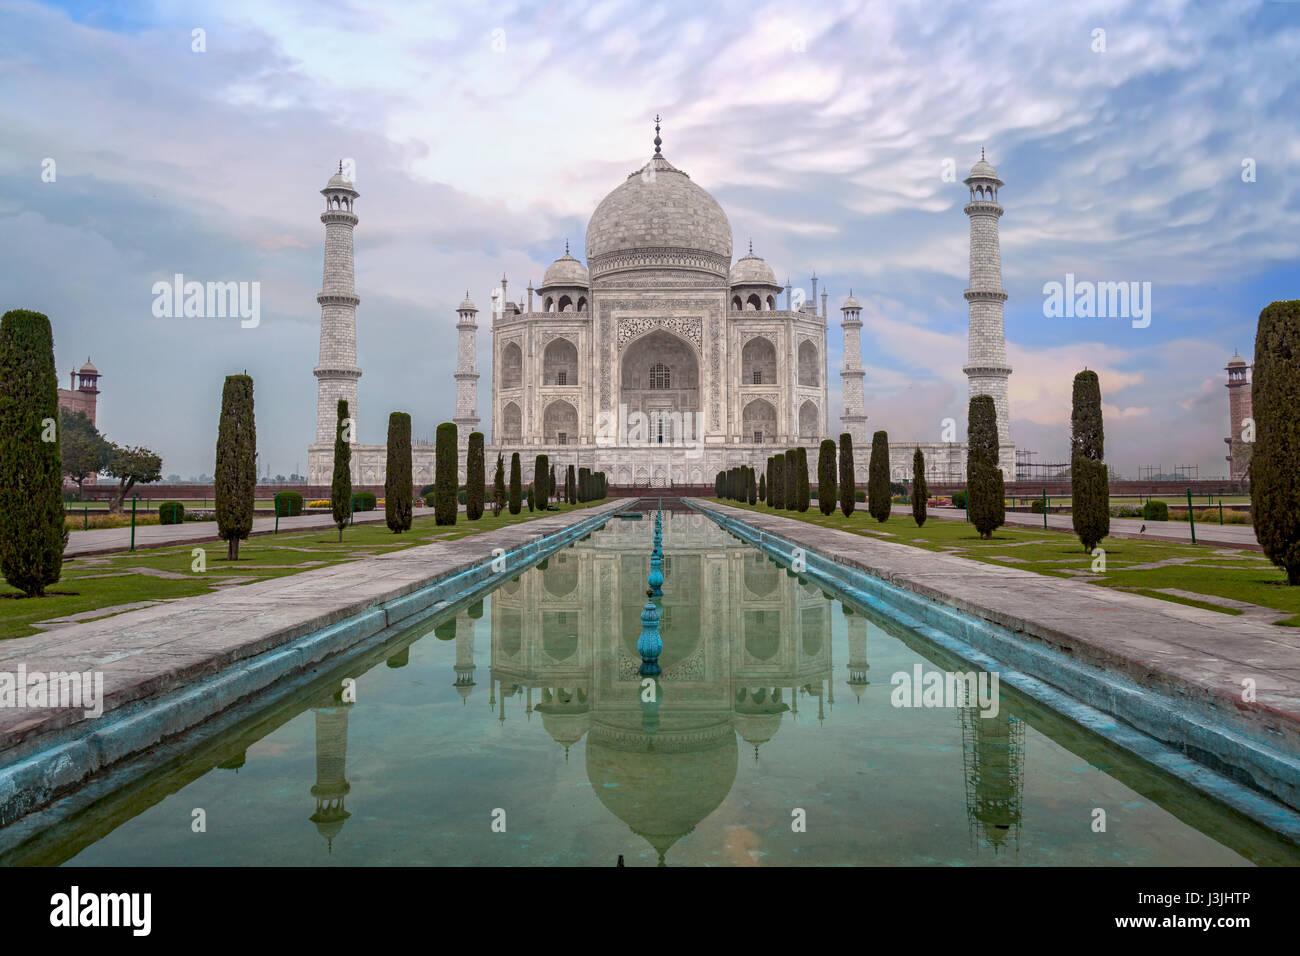 Taj Mahal at sunrise. Taj Mahal is a white marble mausoleum at Agra designated as the UNESCO World Heritage site. - Stock Image